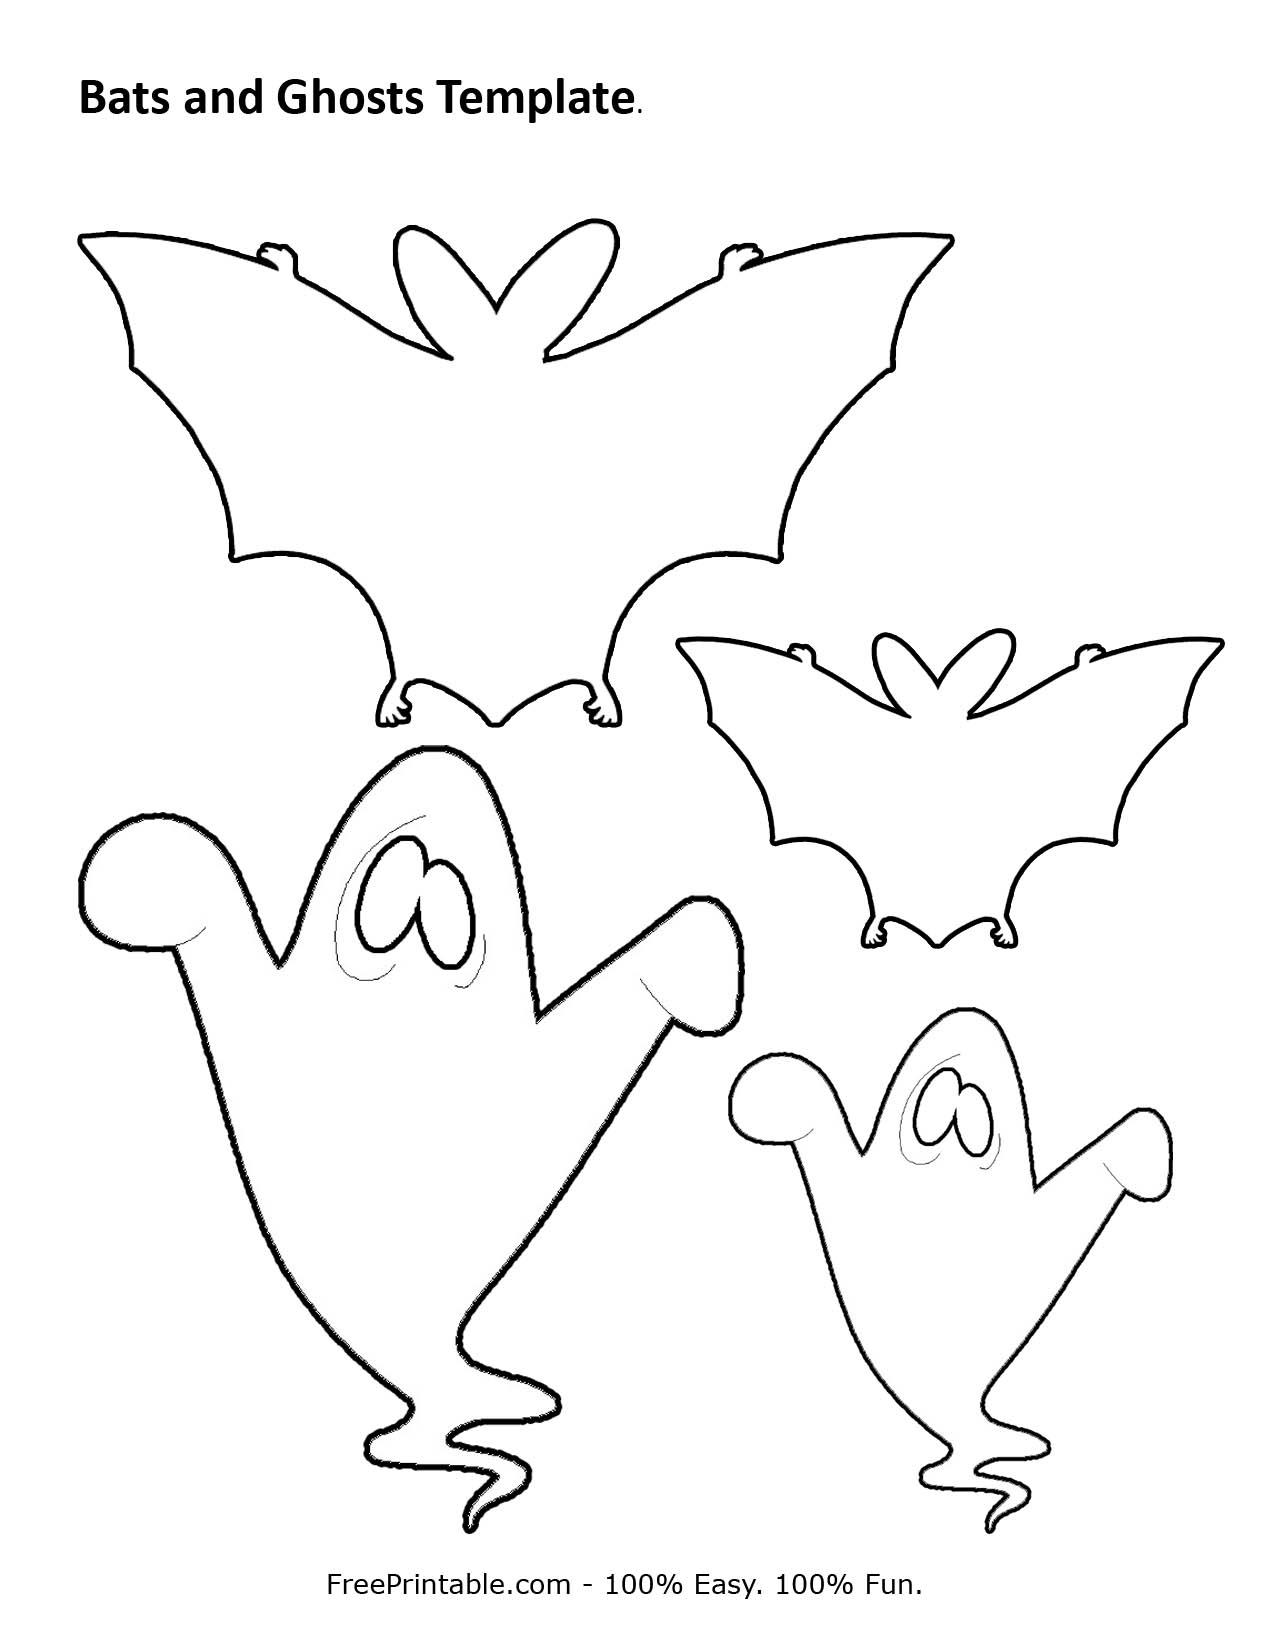 Bat wing template http fantasiesnetwork com fiimages bat wing template